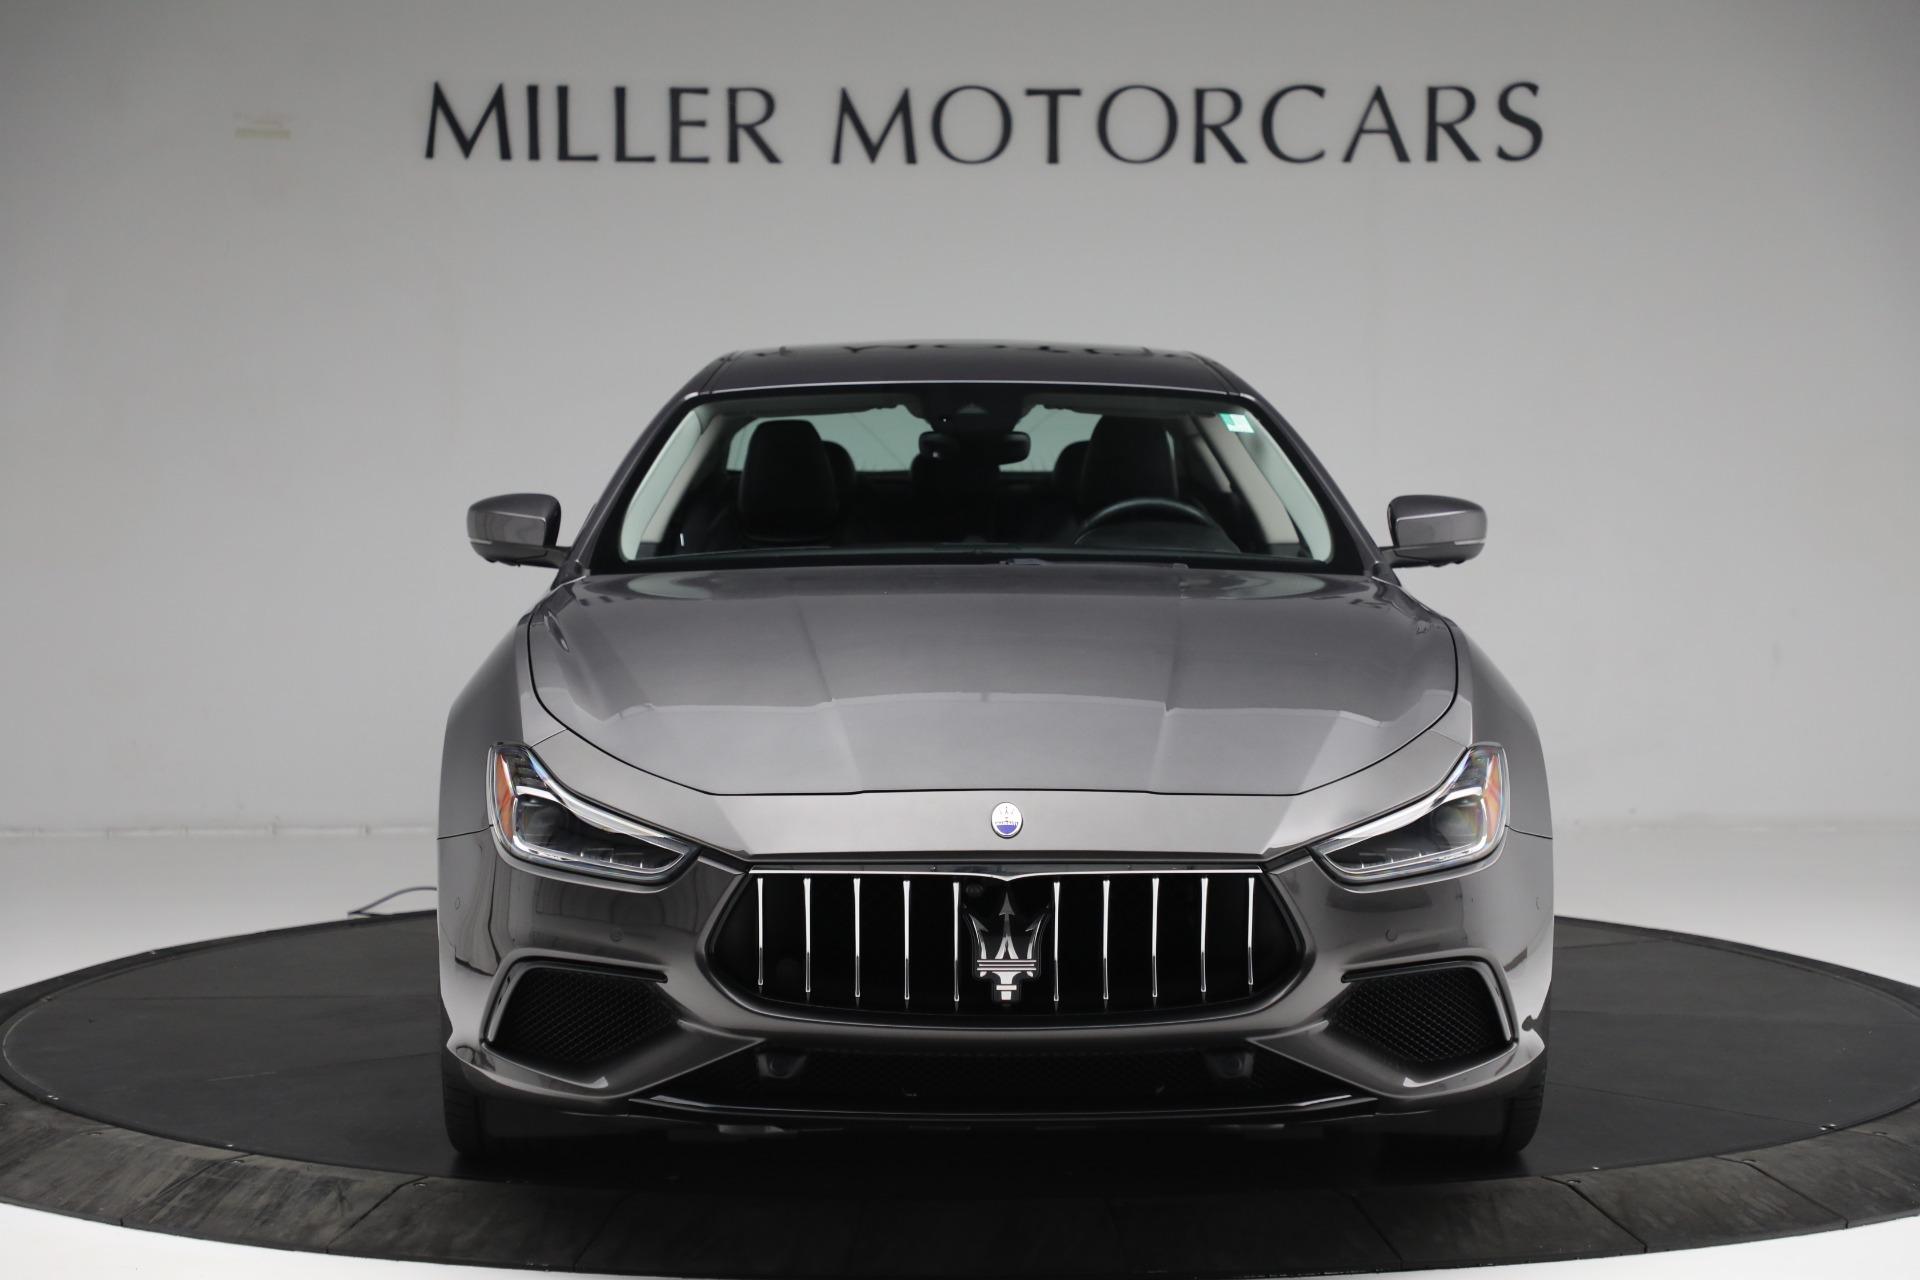 New 2019 Maserati Ghibli S Q4 GranSport For Sale In Greenwich, CT 3493_p11